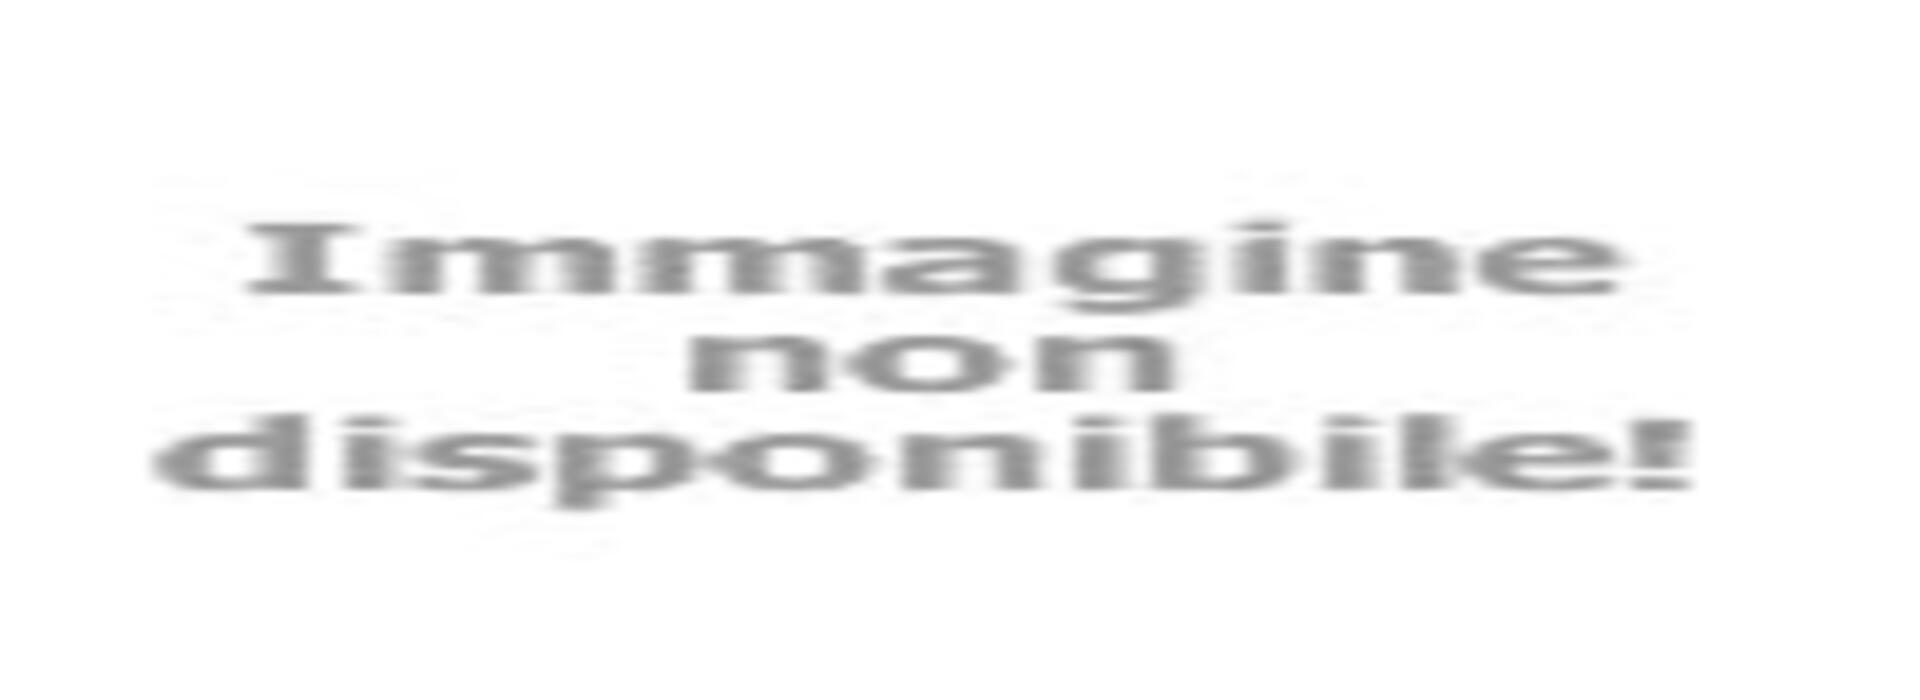 hotel-montecarlo hu kornyezetvedelem 019